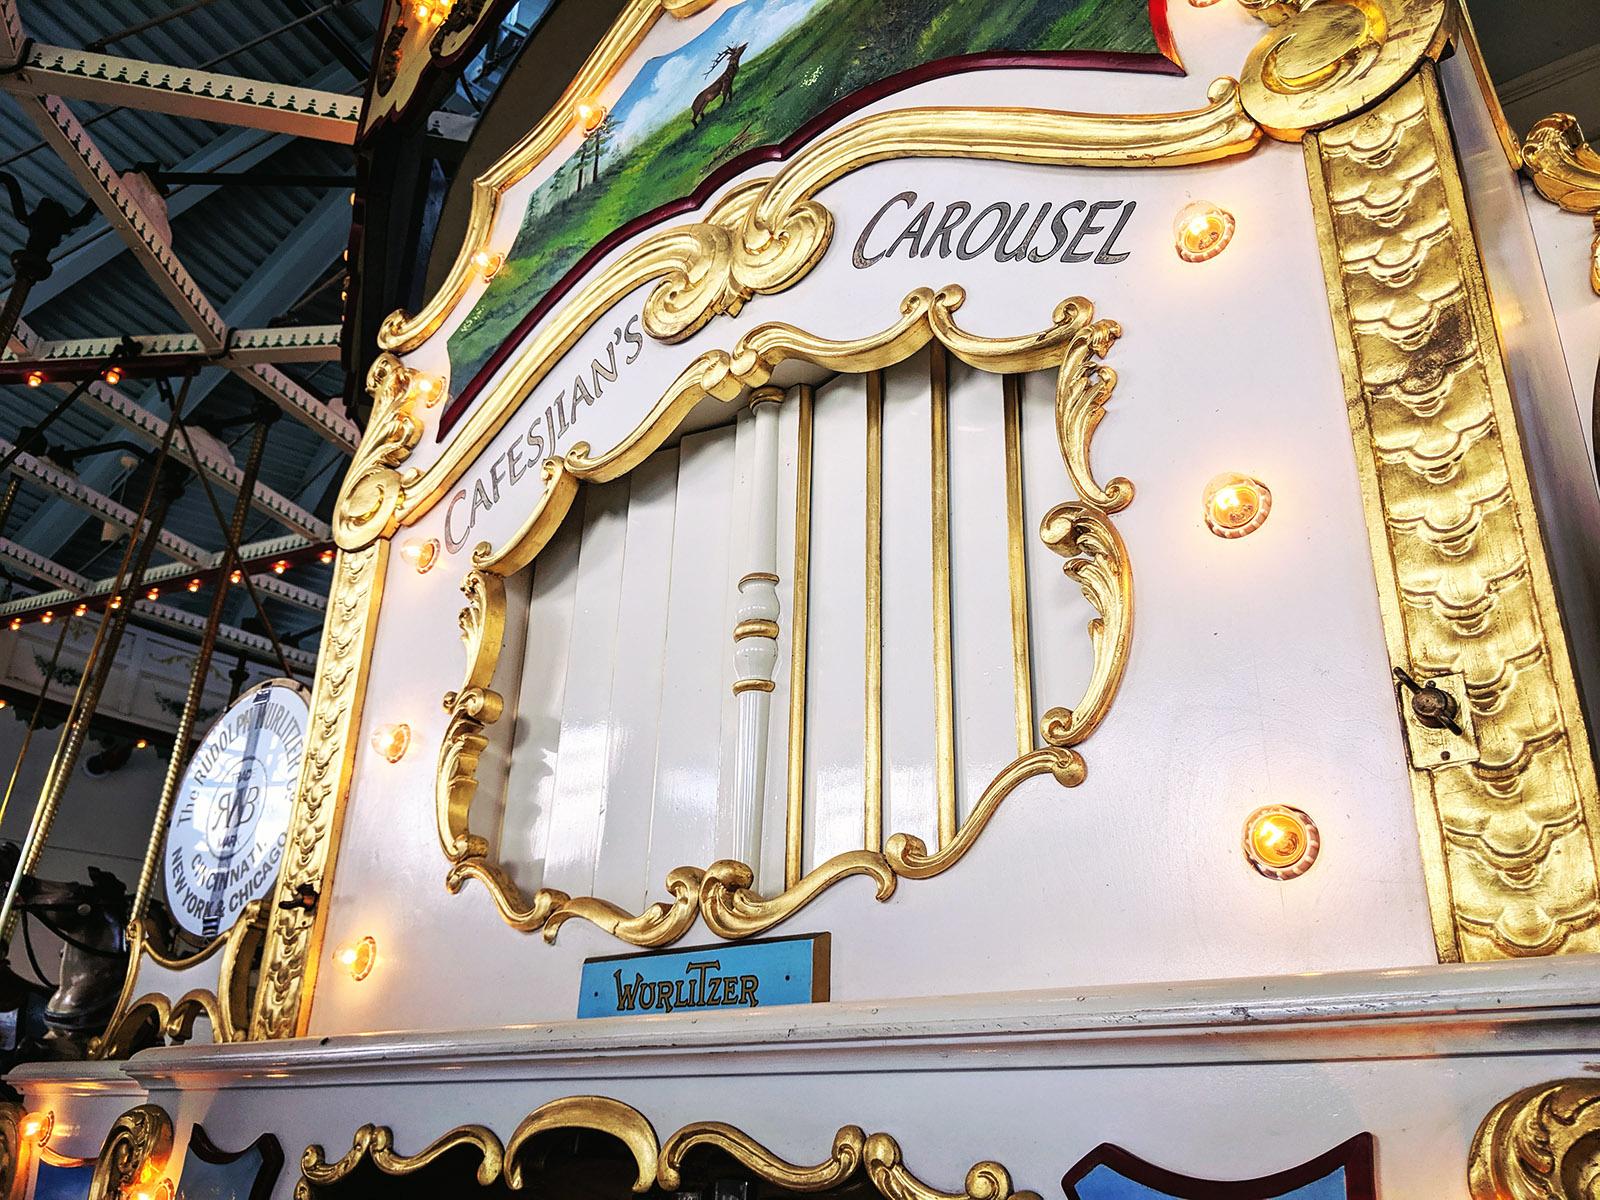 Cafesjian's Carousel Organ